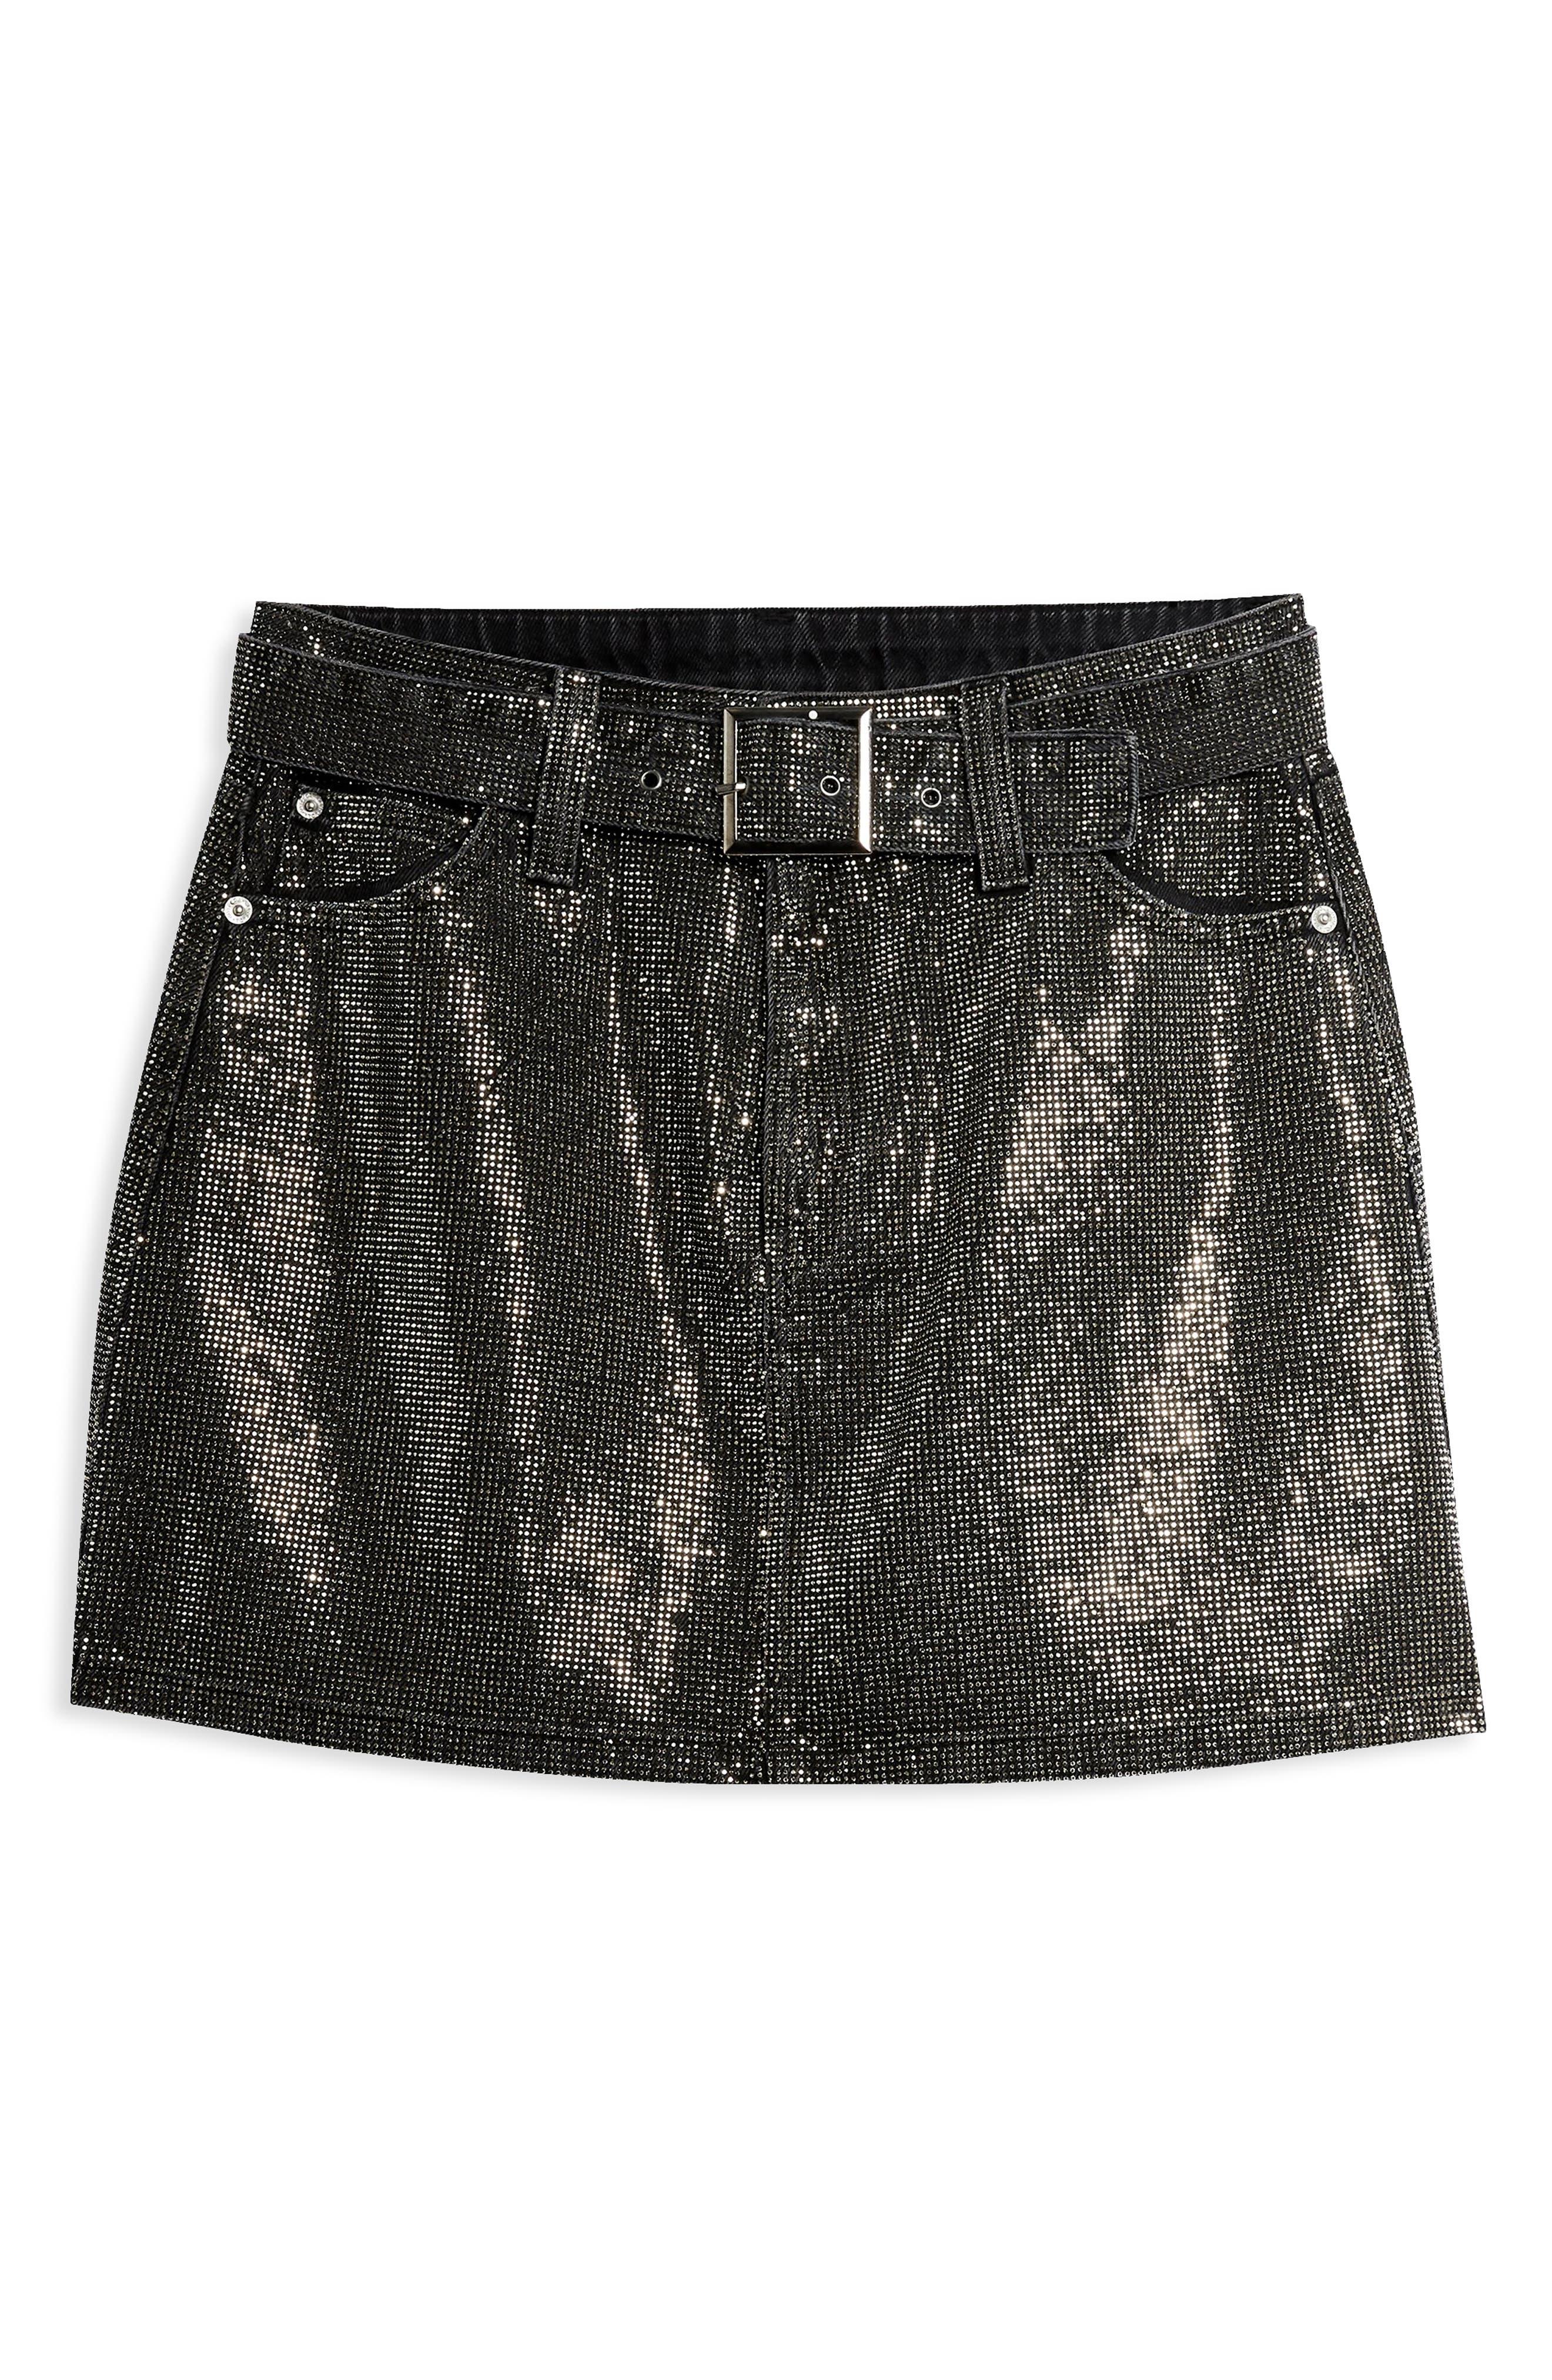 Crystal Pin Stud Denim Skirt,                             Alternate thumbnail 3, color,                             WASHED BLACK